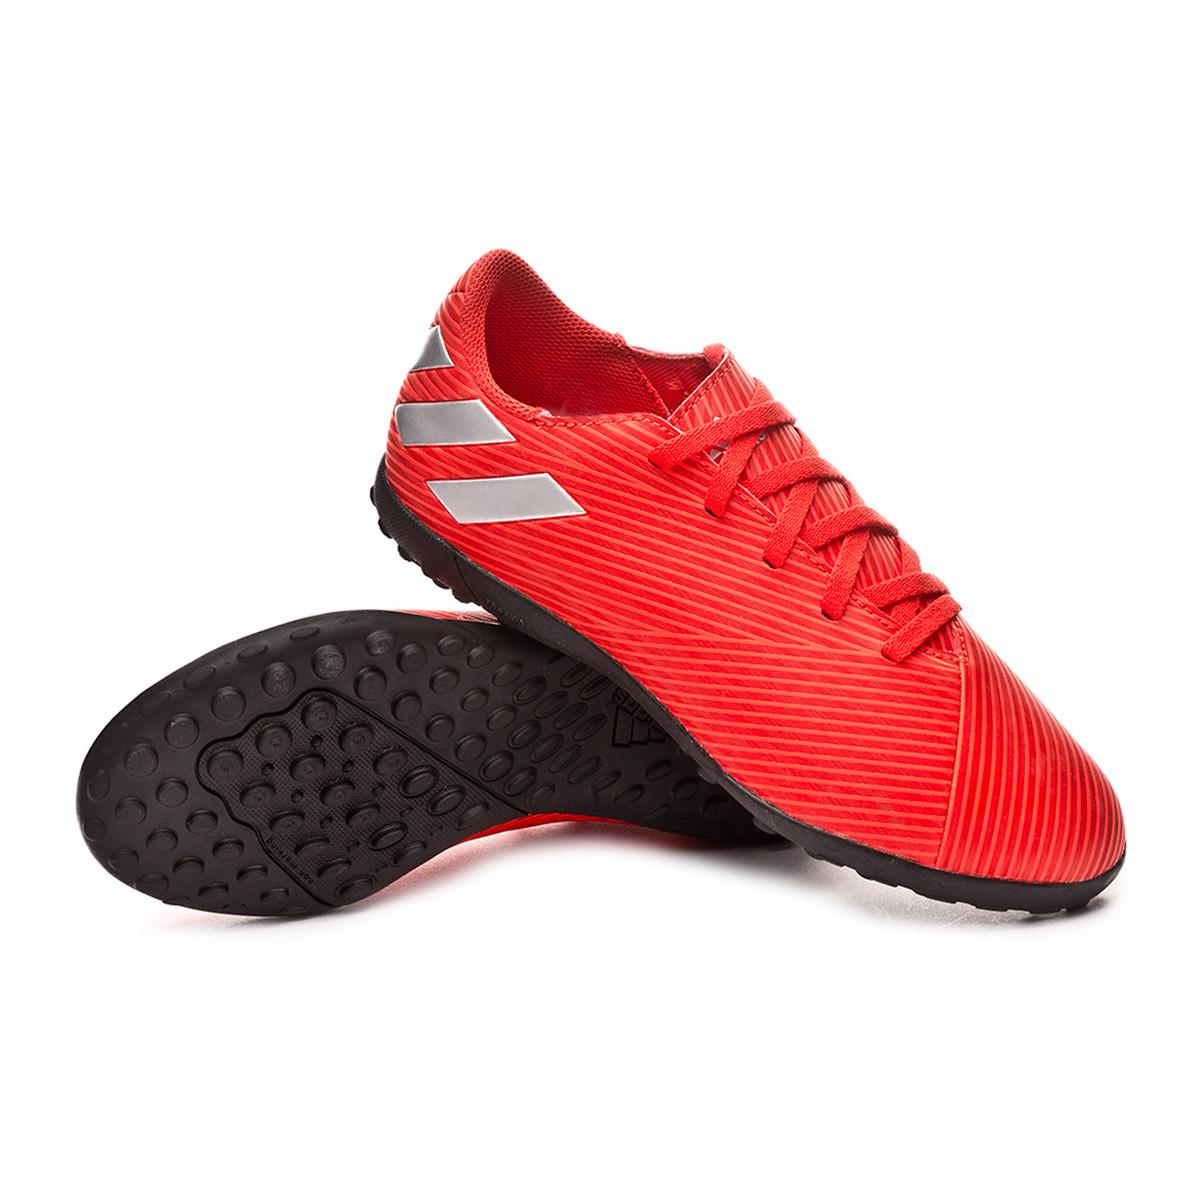 Nemeziz turf 19.4 jr Chaussures de foot